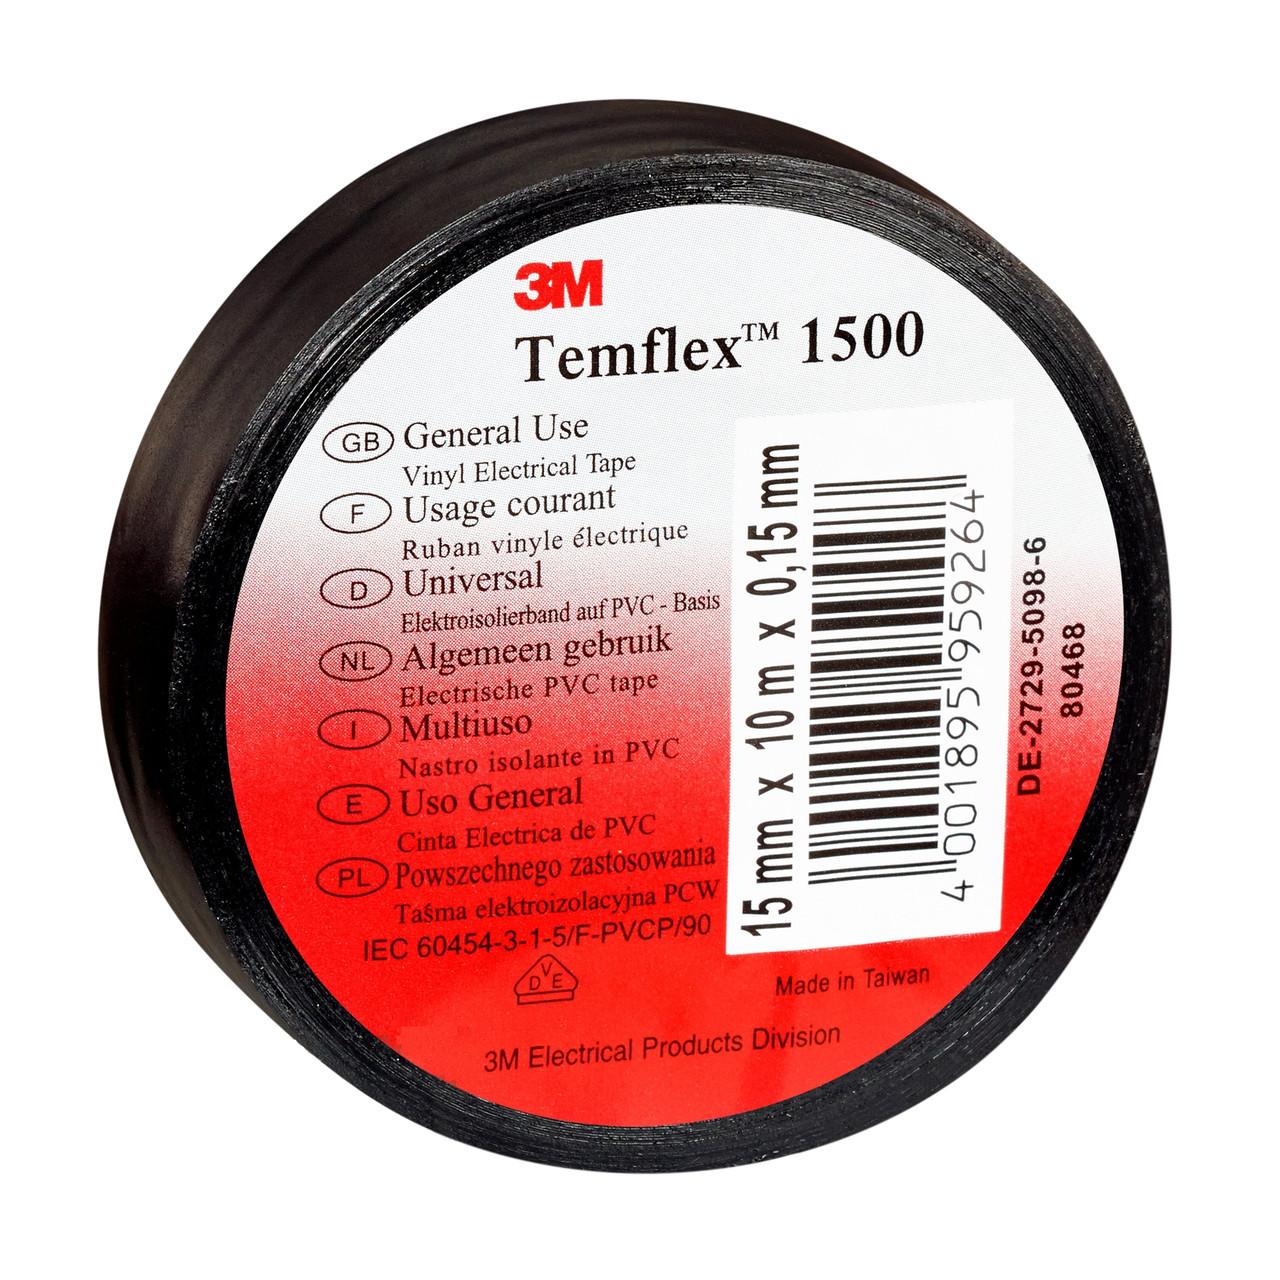 Изолента 3M Temflex™ 1500 ПВХ лента, черная, (15мм x 10м х 0,15мм)